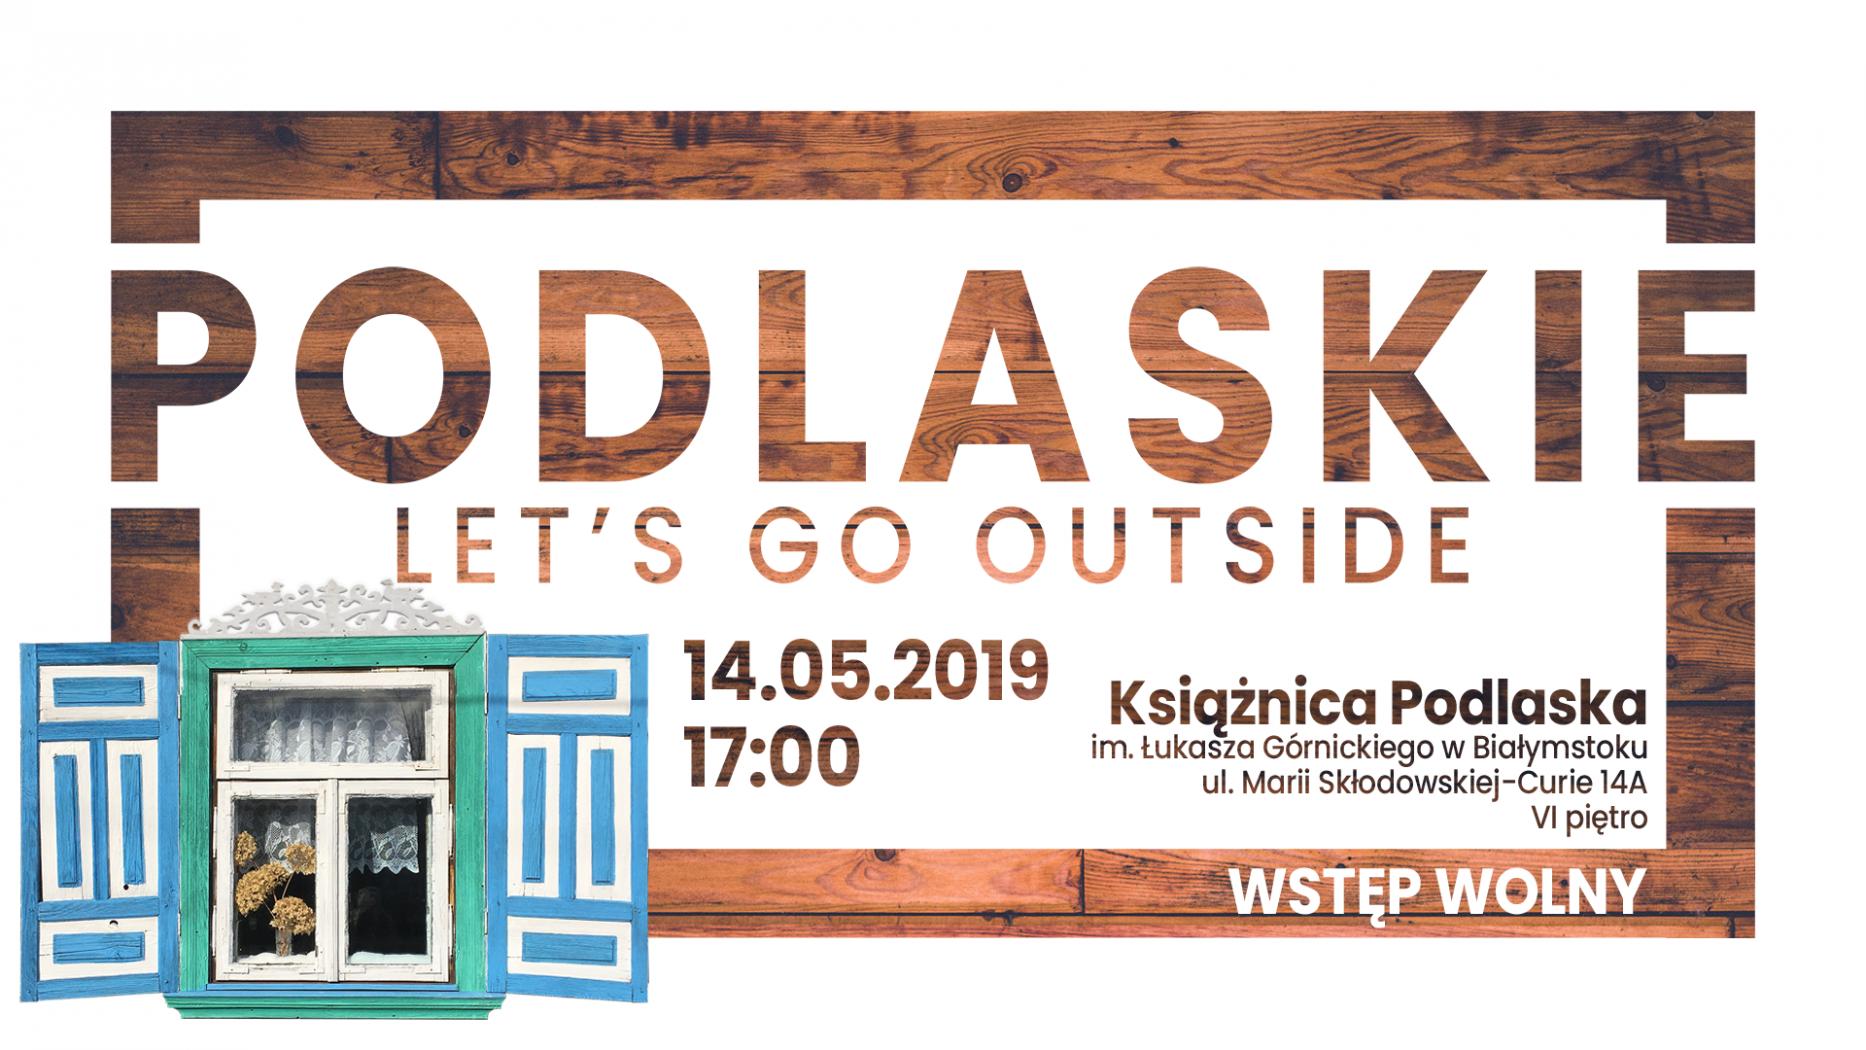 Podlaskie. Let's Go Outside - Drewniane Podlasie